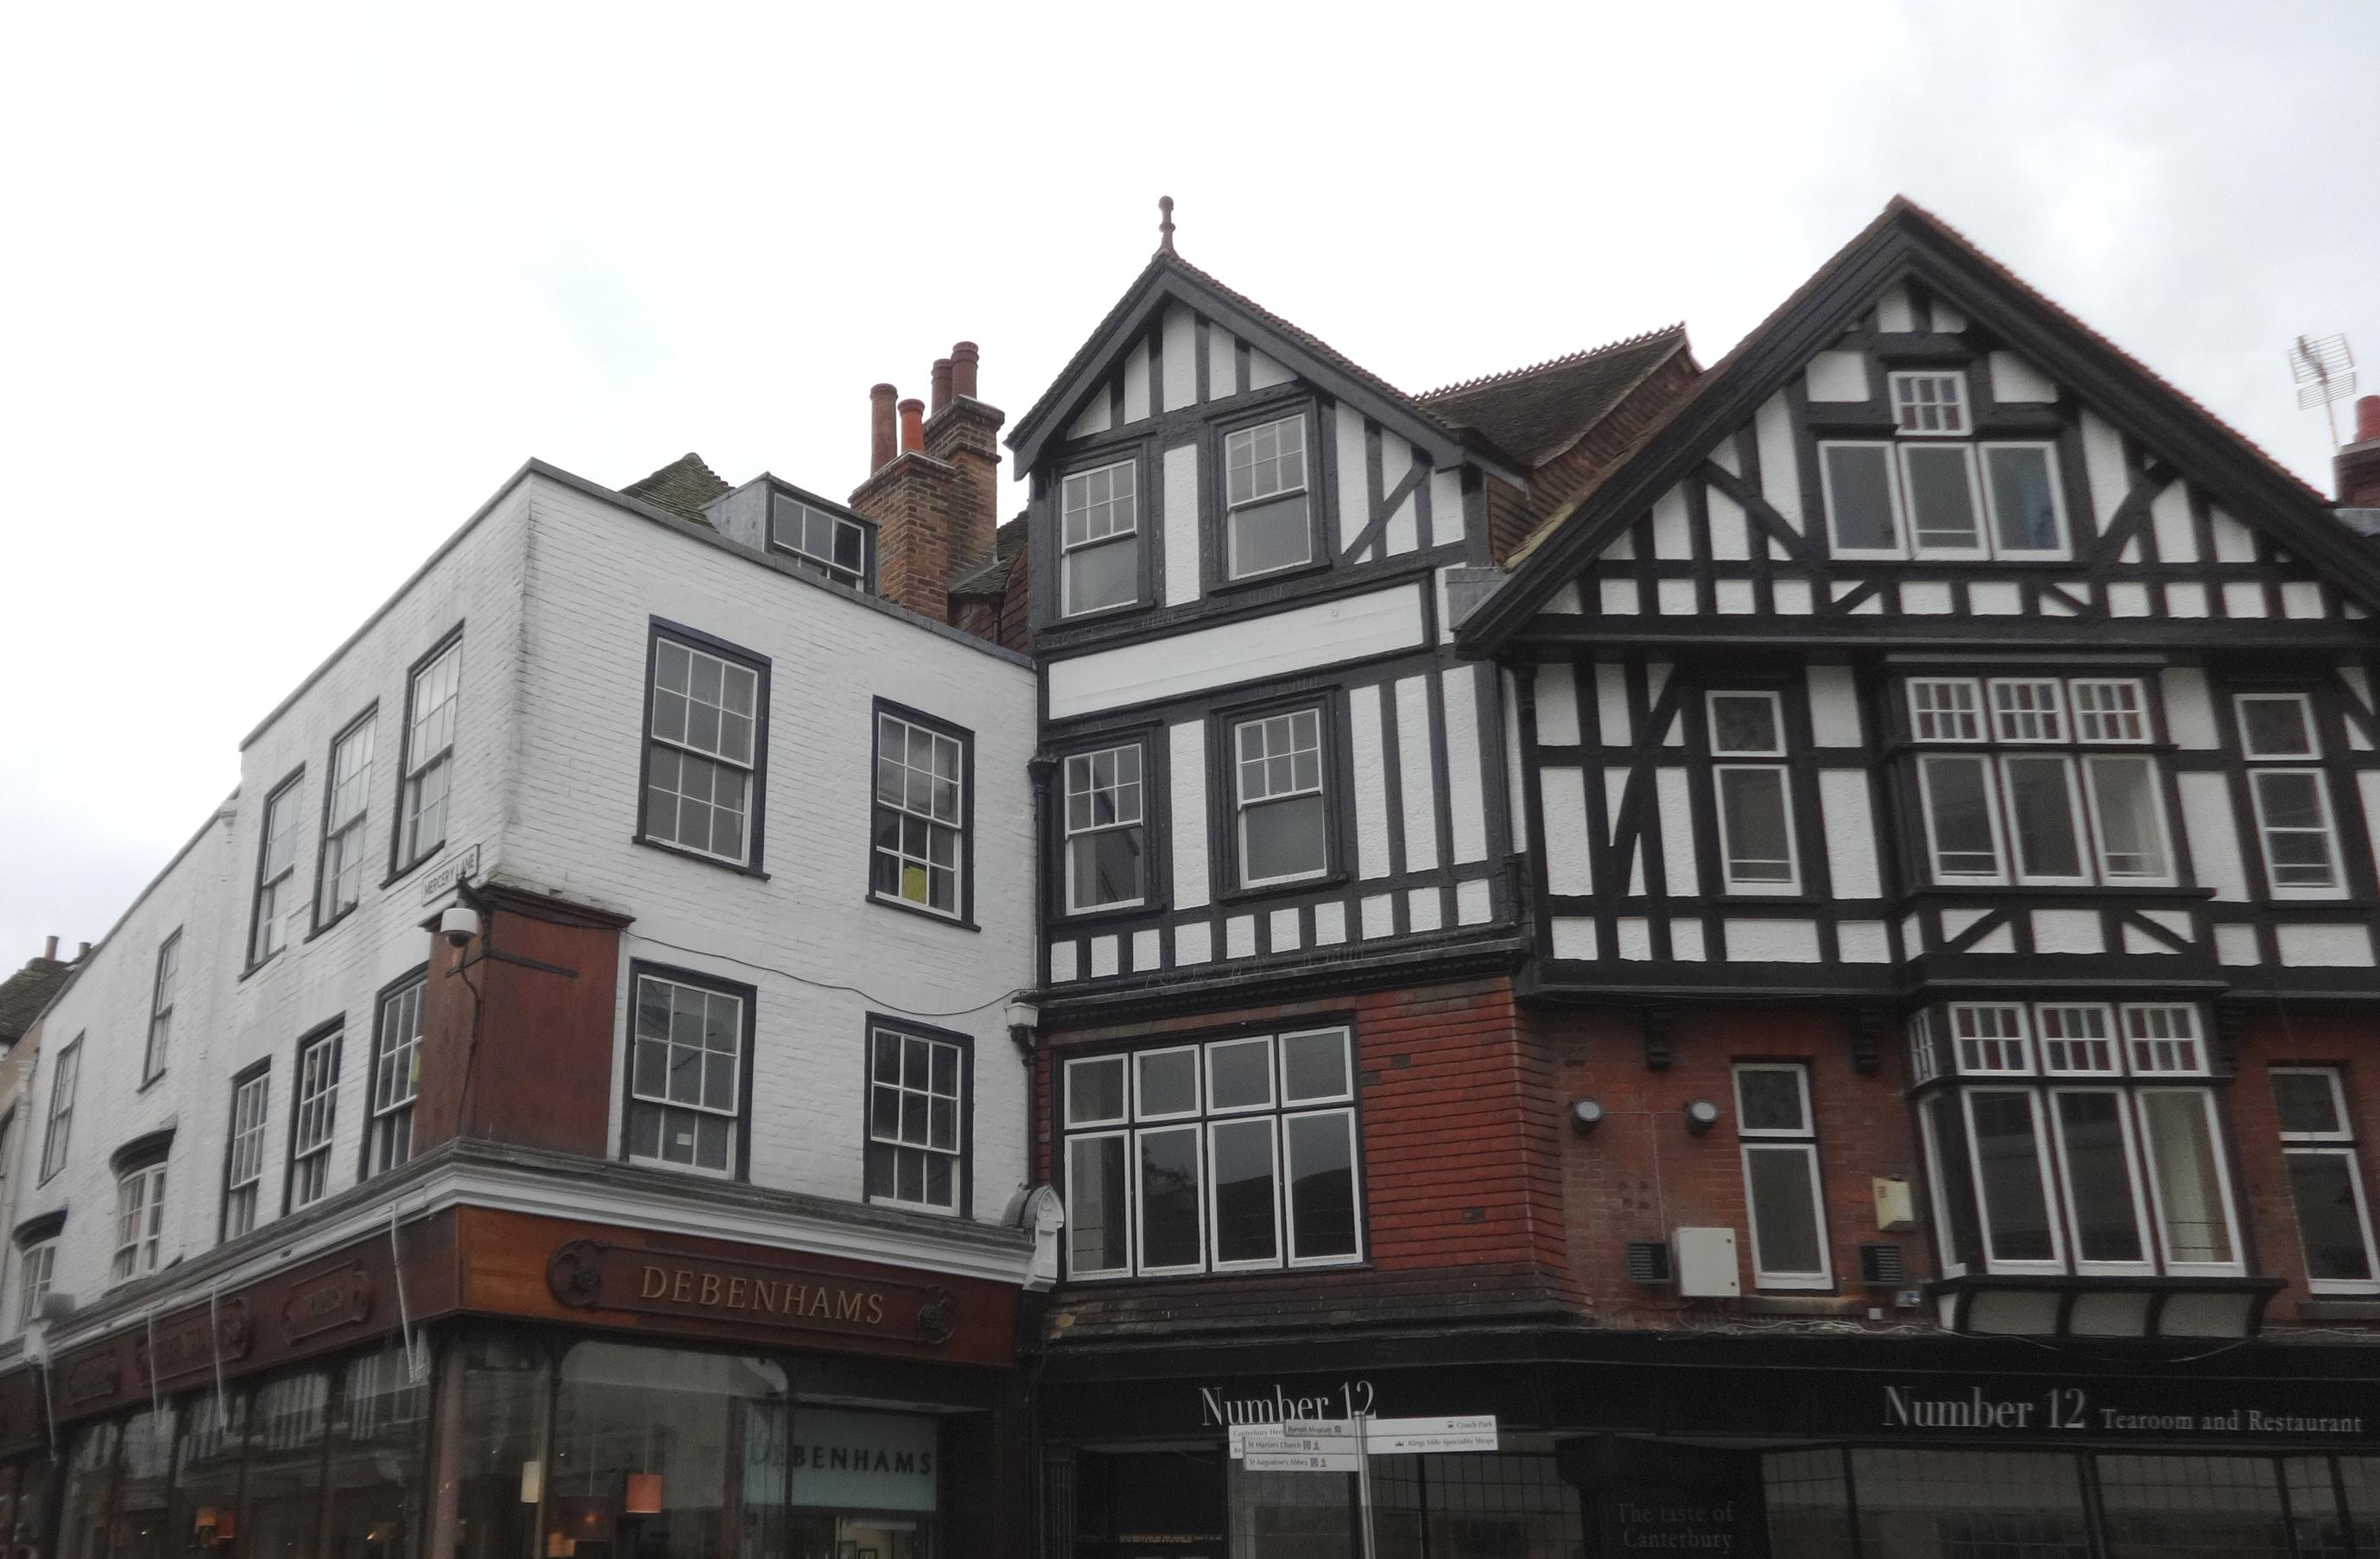 Canterbury 5 _Highstreet1_ProjectAbroad.Eu